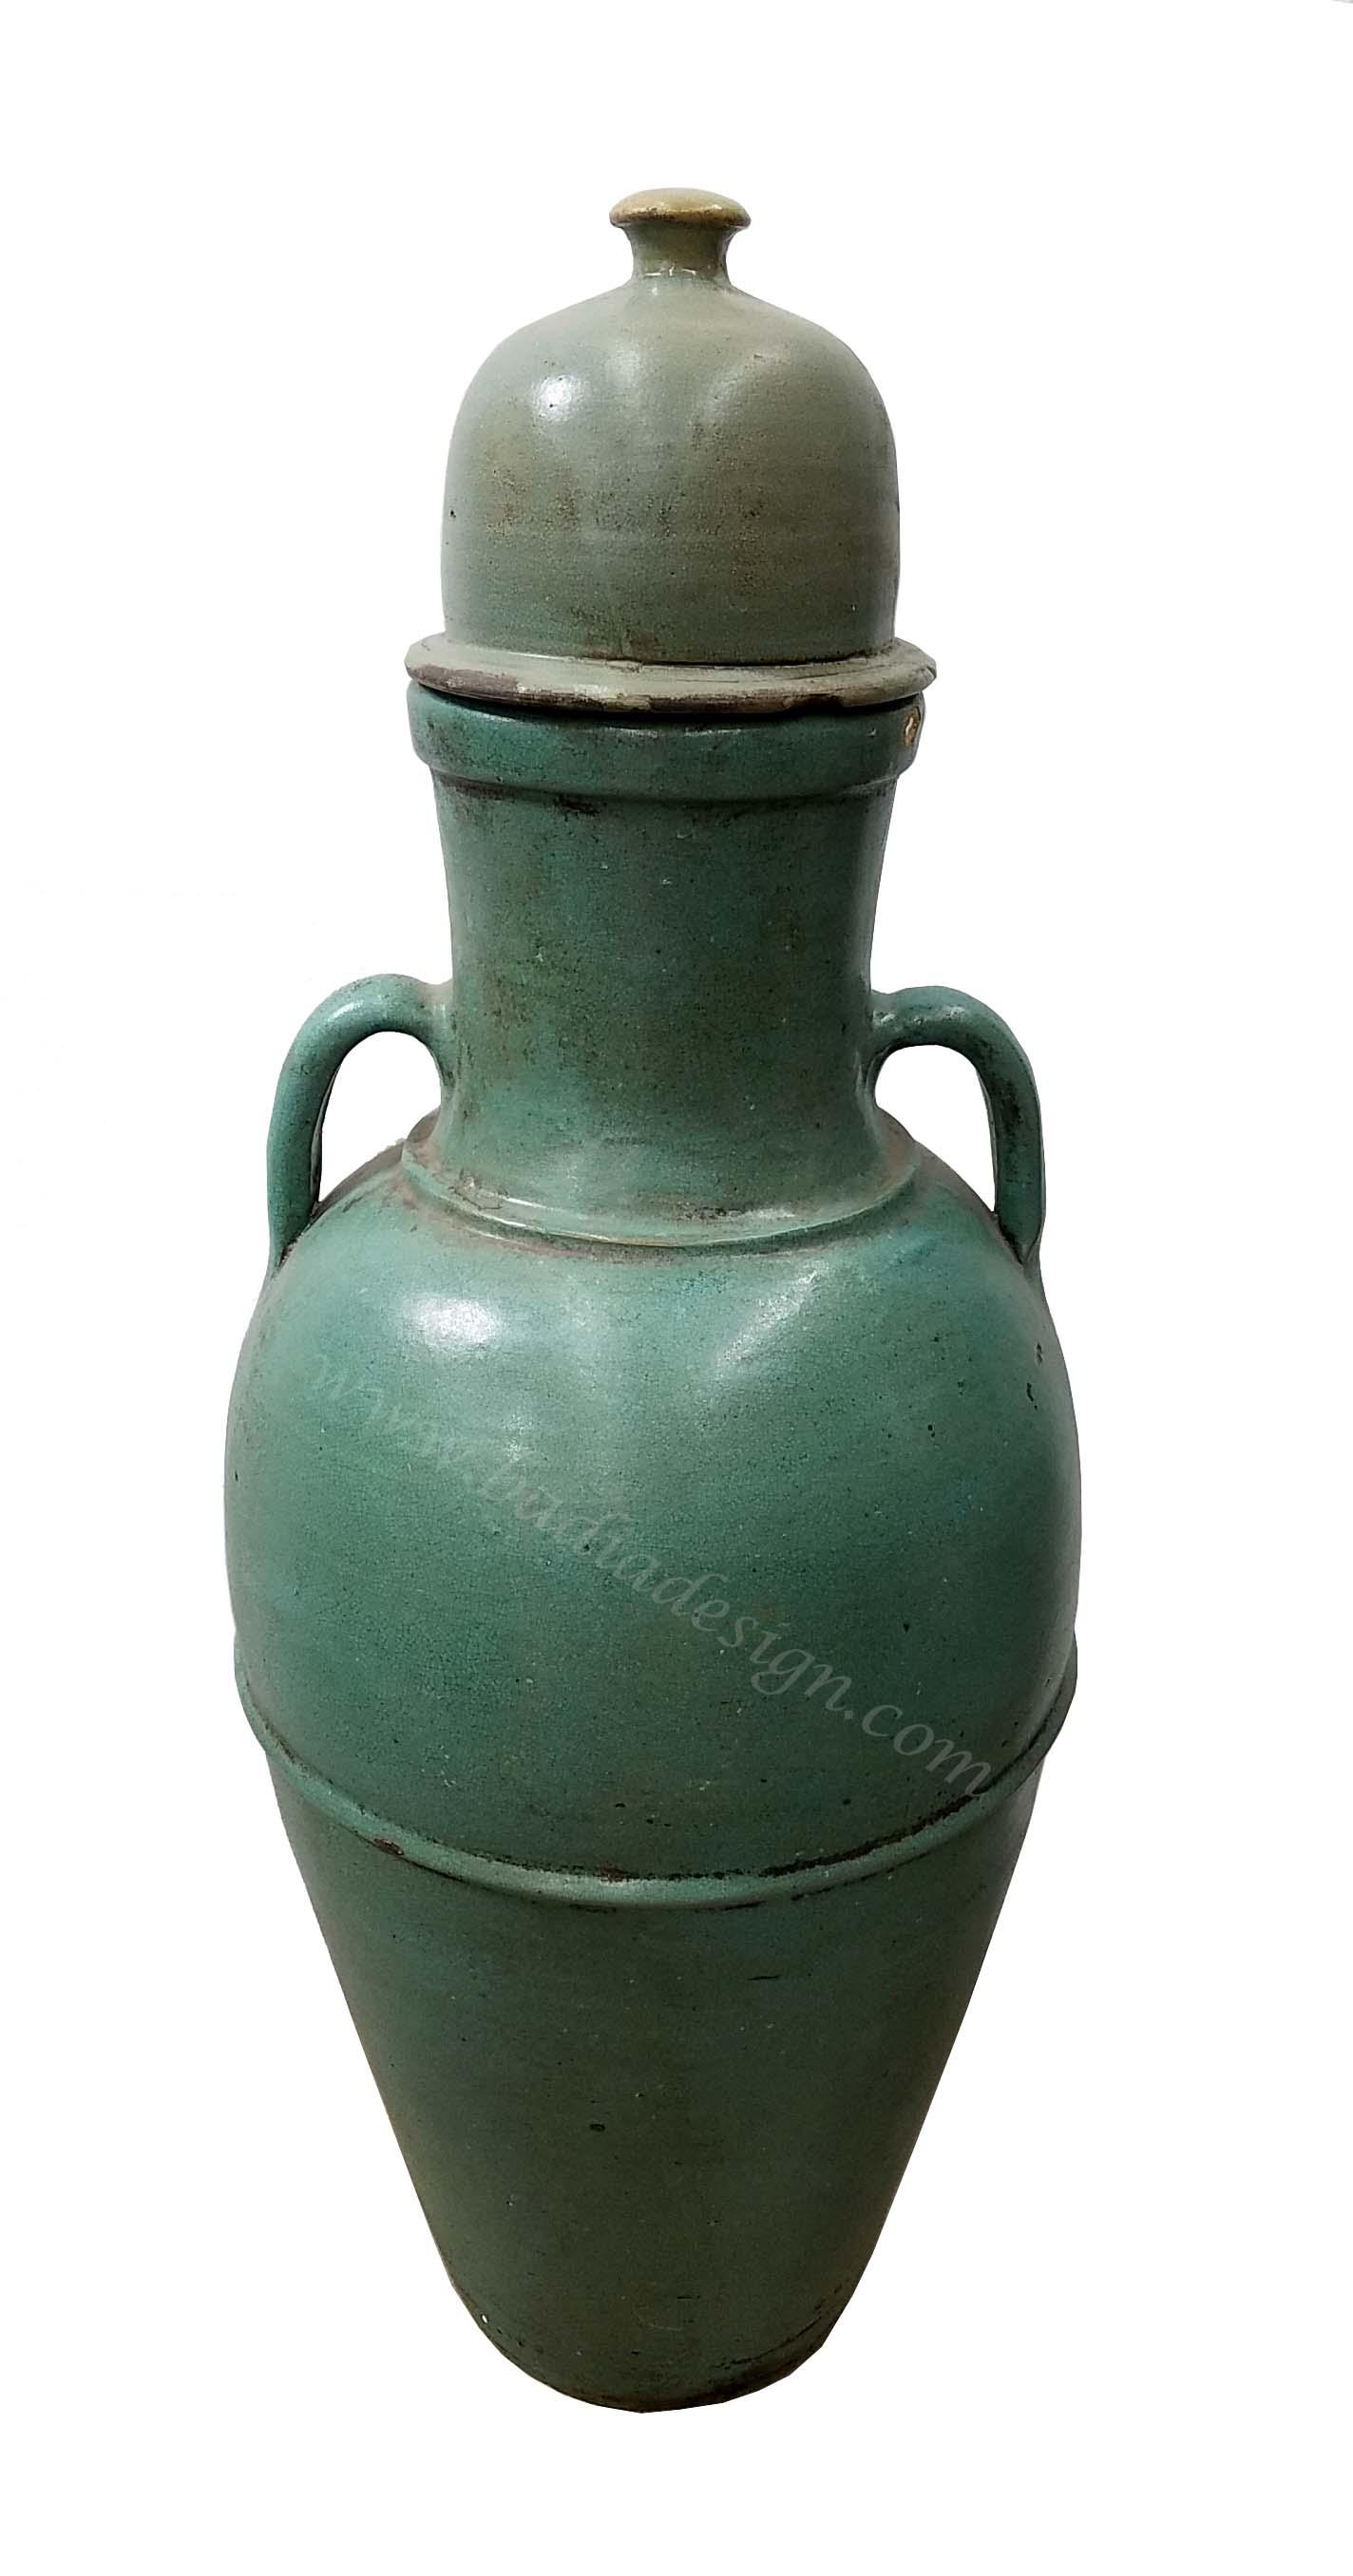 green-moroccan-ceramic-urn-va071.jpg